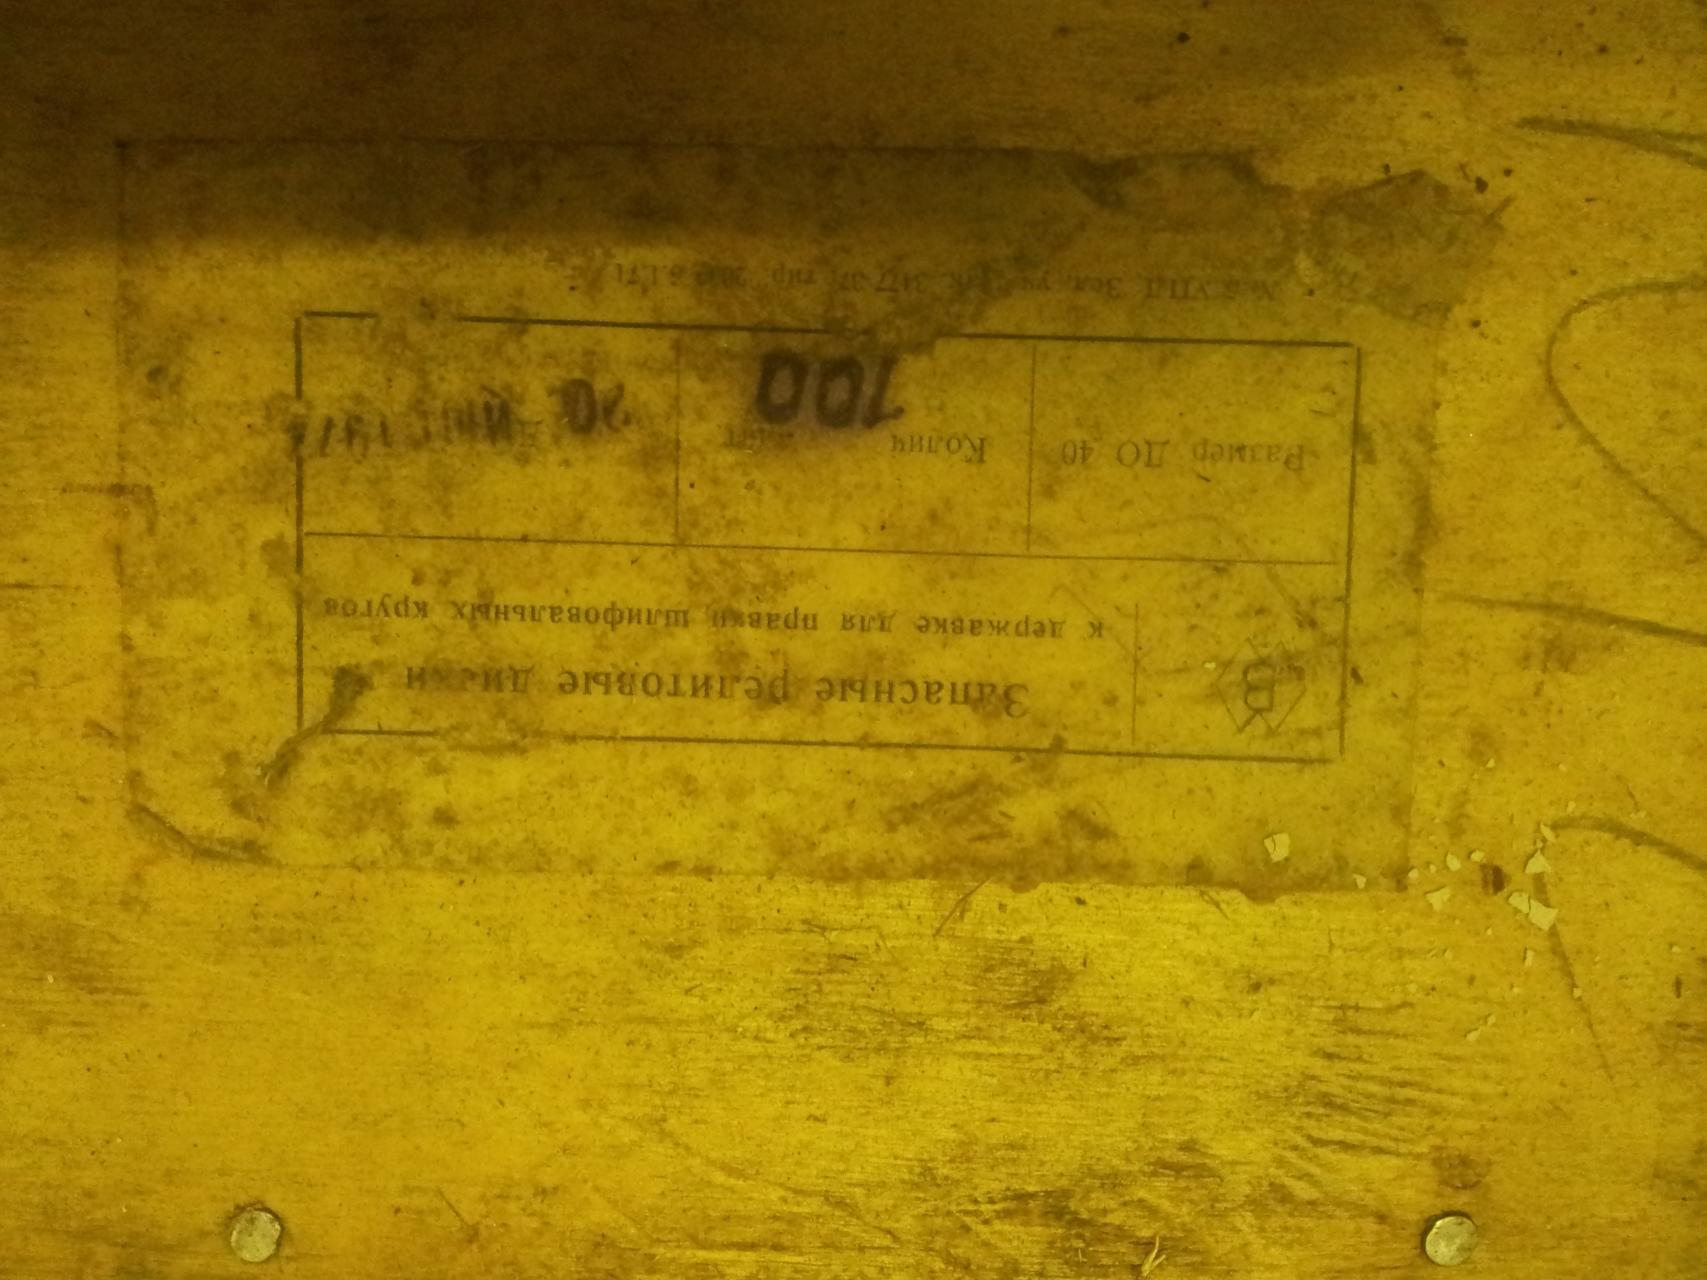 20130619 191952